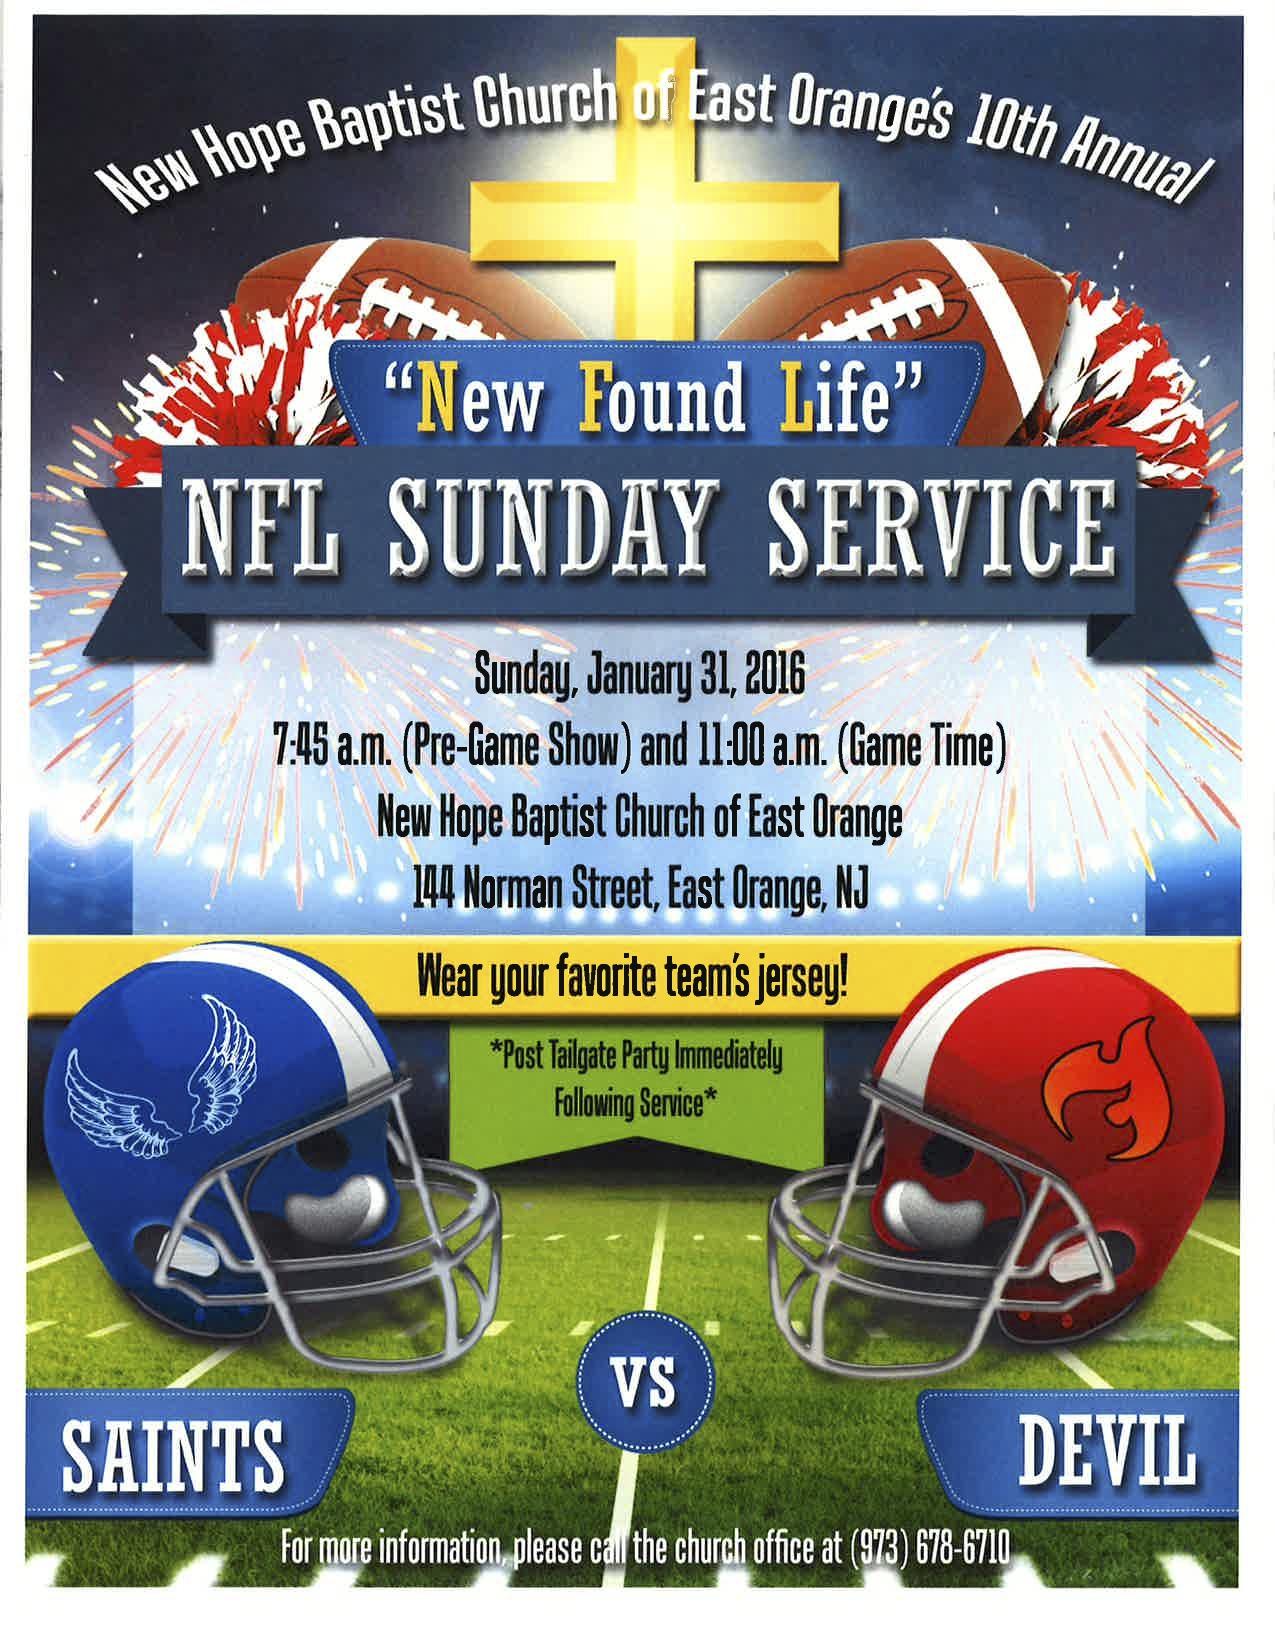 171d204ec11eae128bbf_NFL_Sunday___New_Hope_Baptist_Church_of_East_Orange_copy.jpg